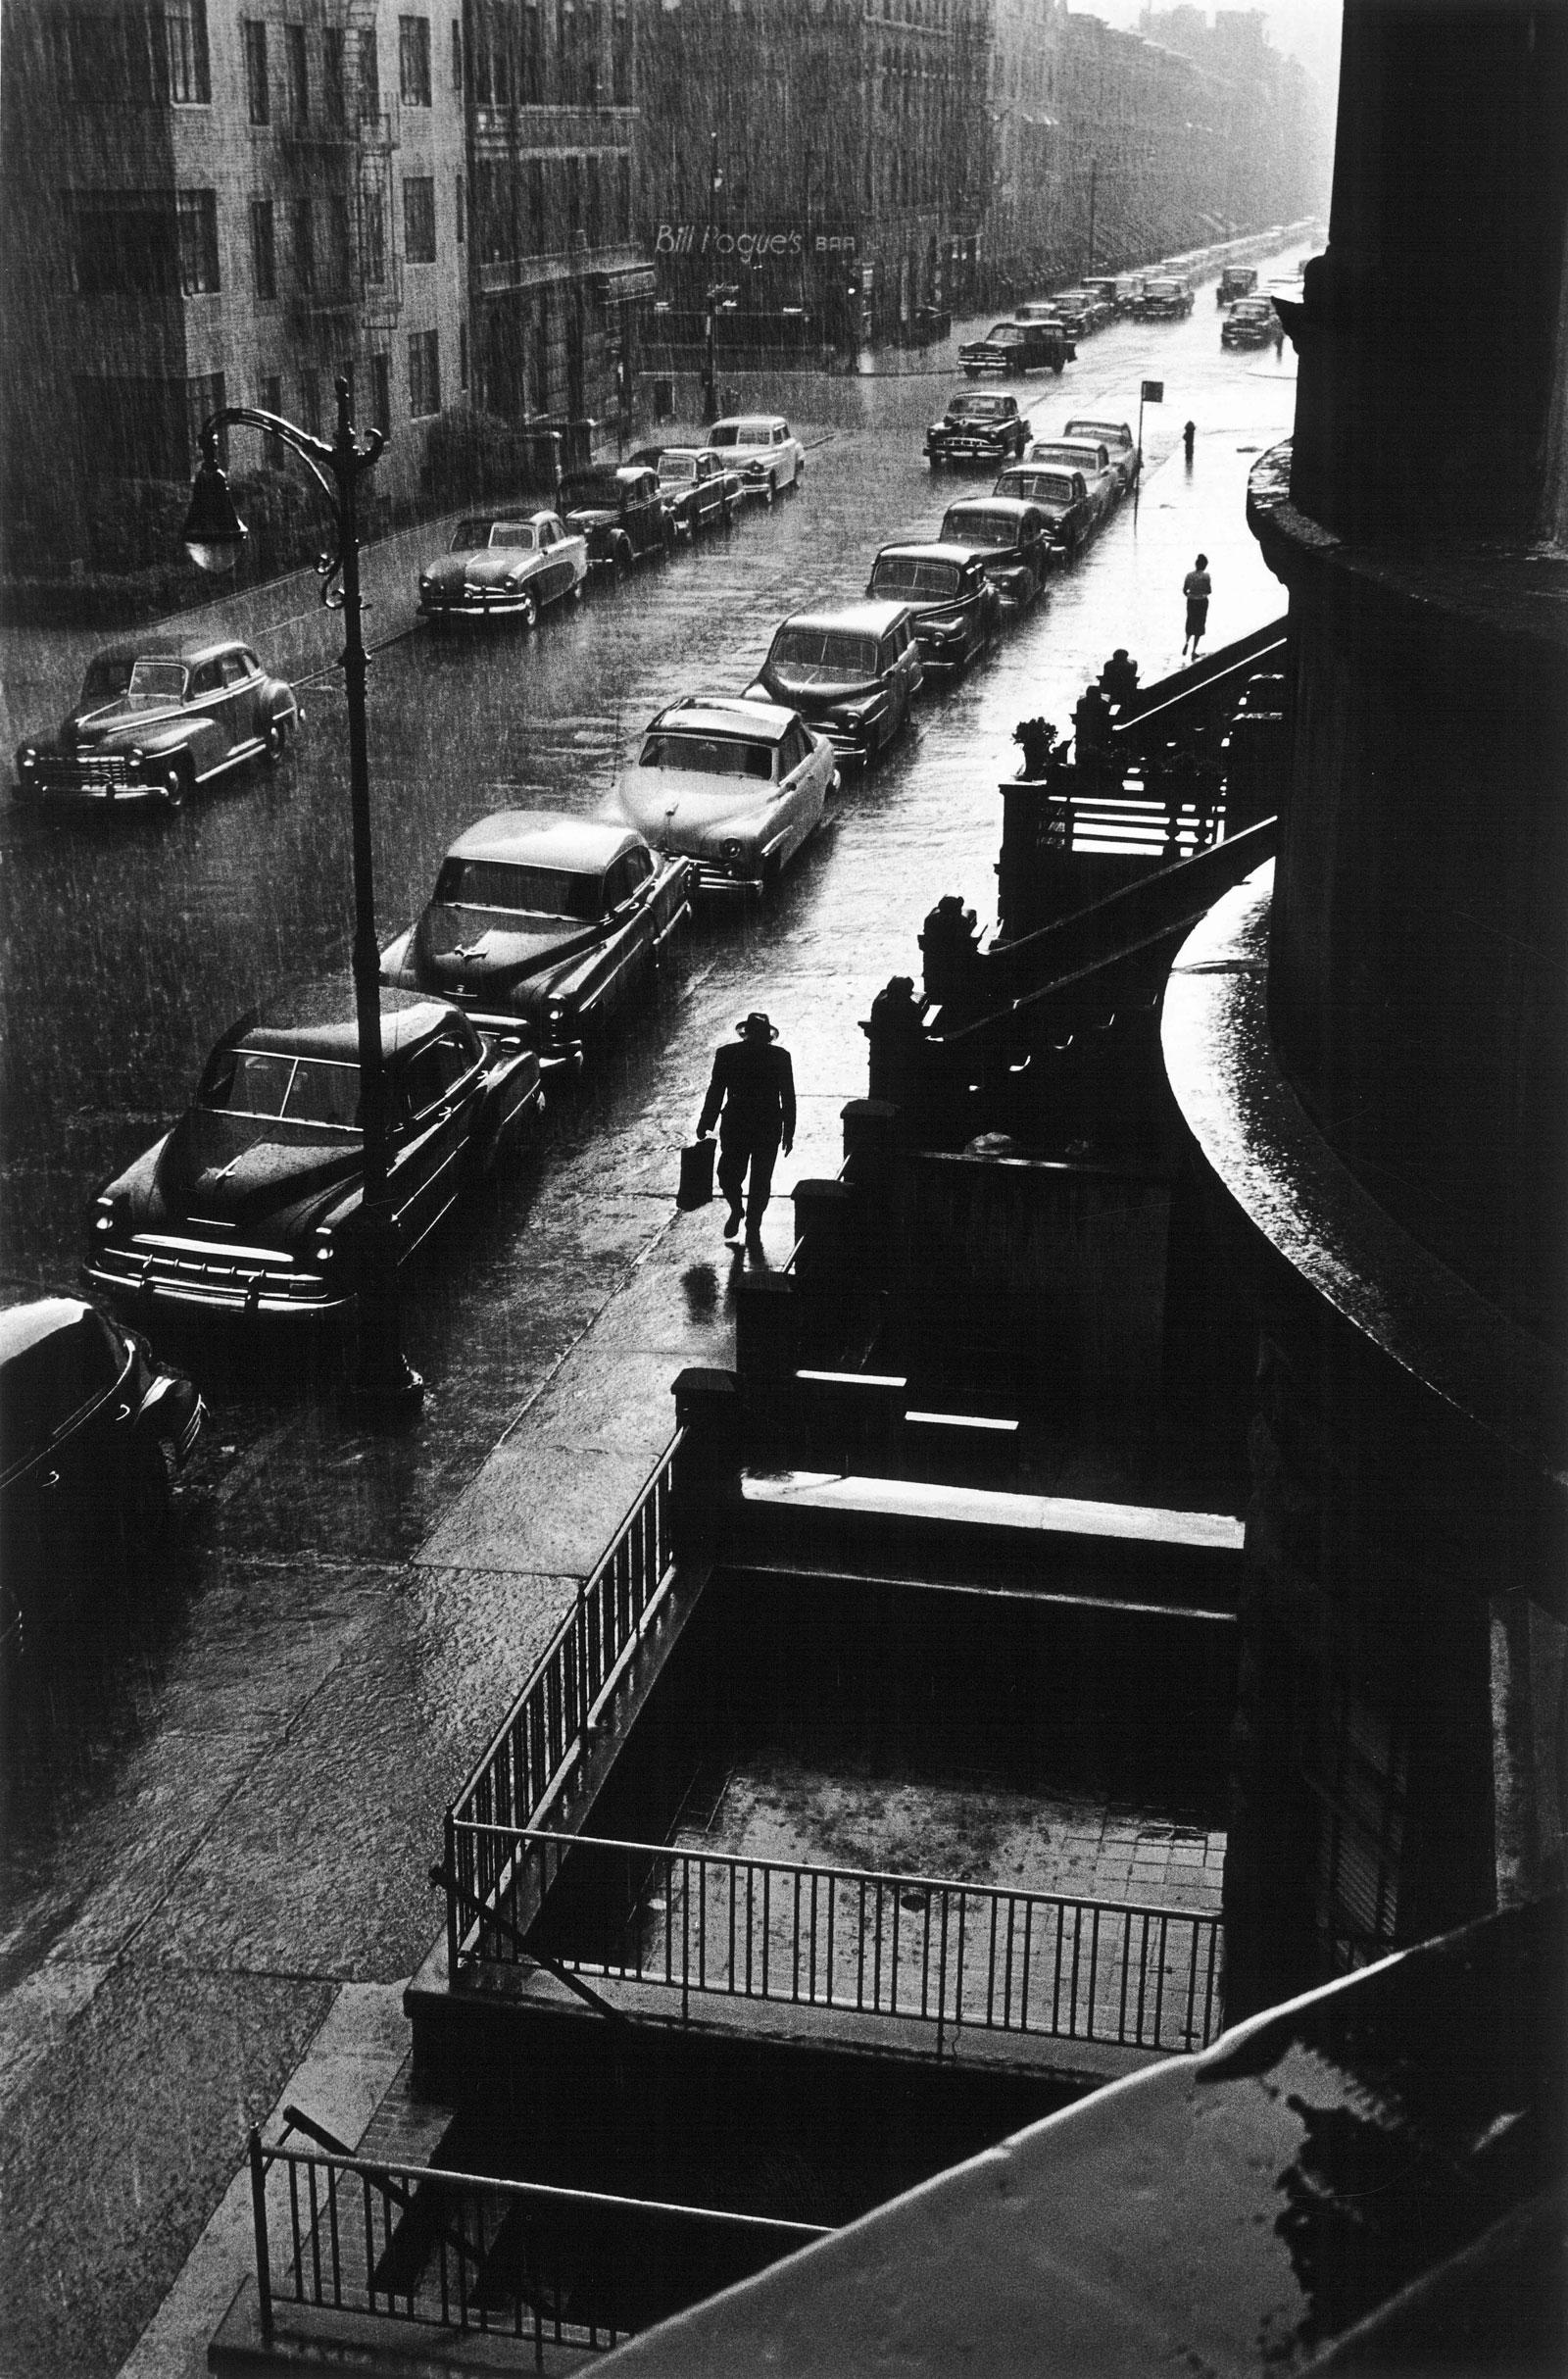 Ruth Orkin Man in Rain West 88th Street New York City 1952